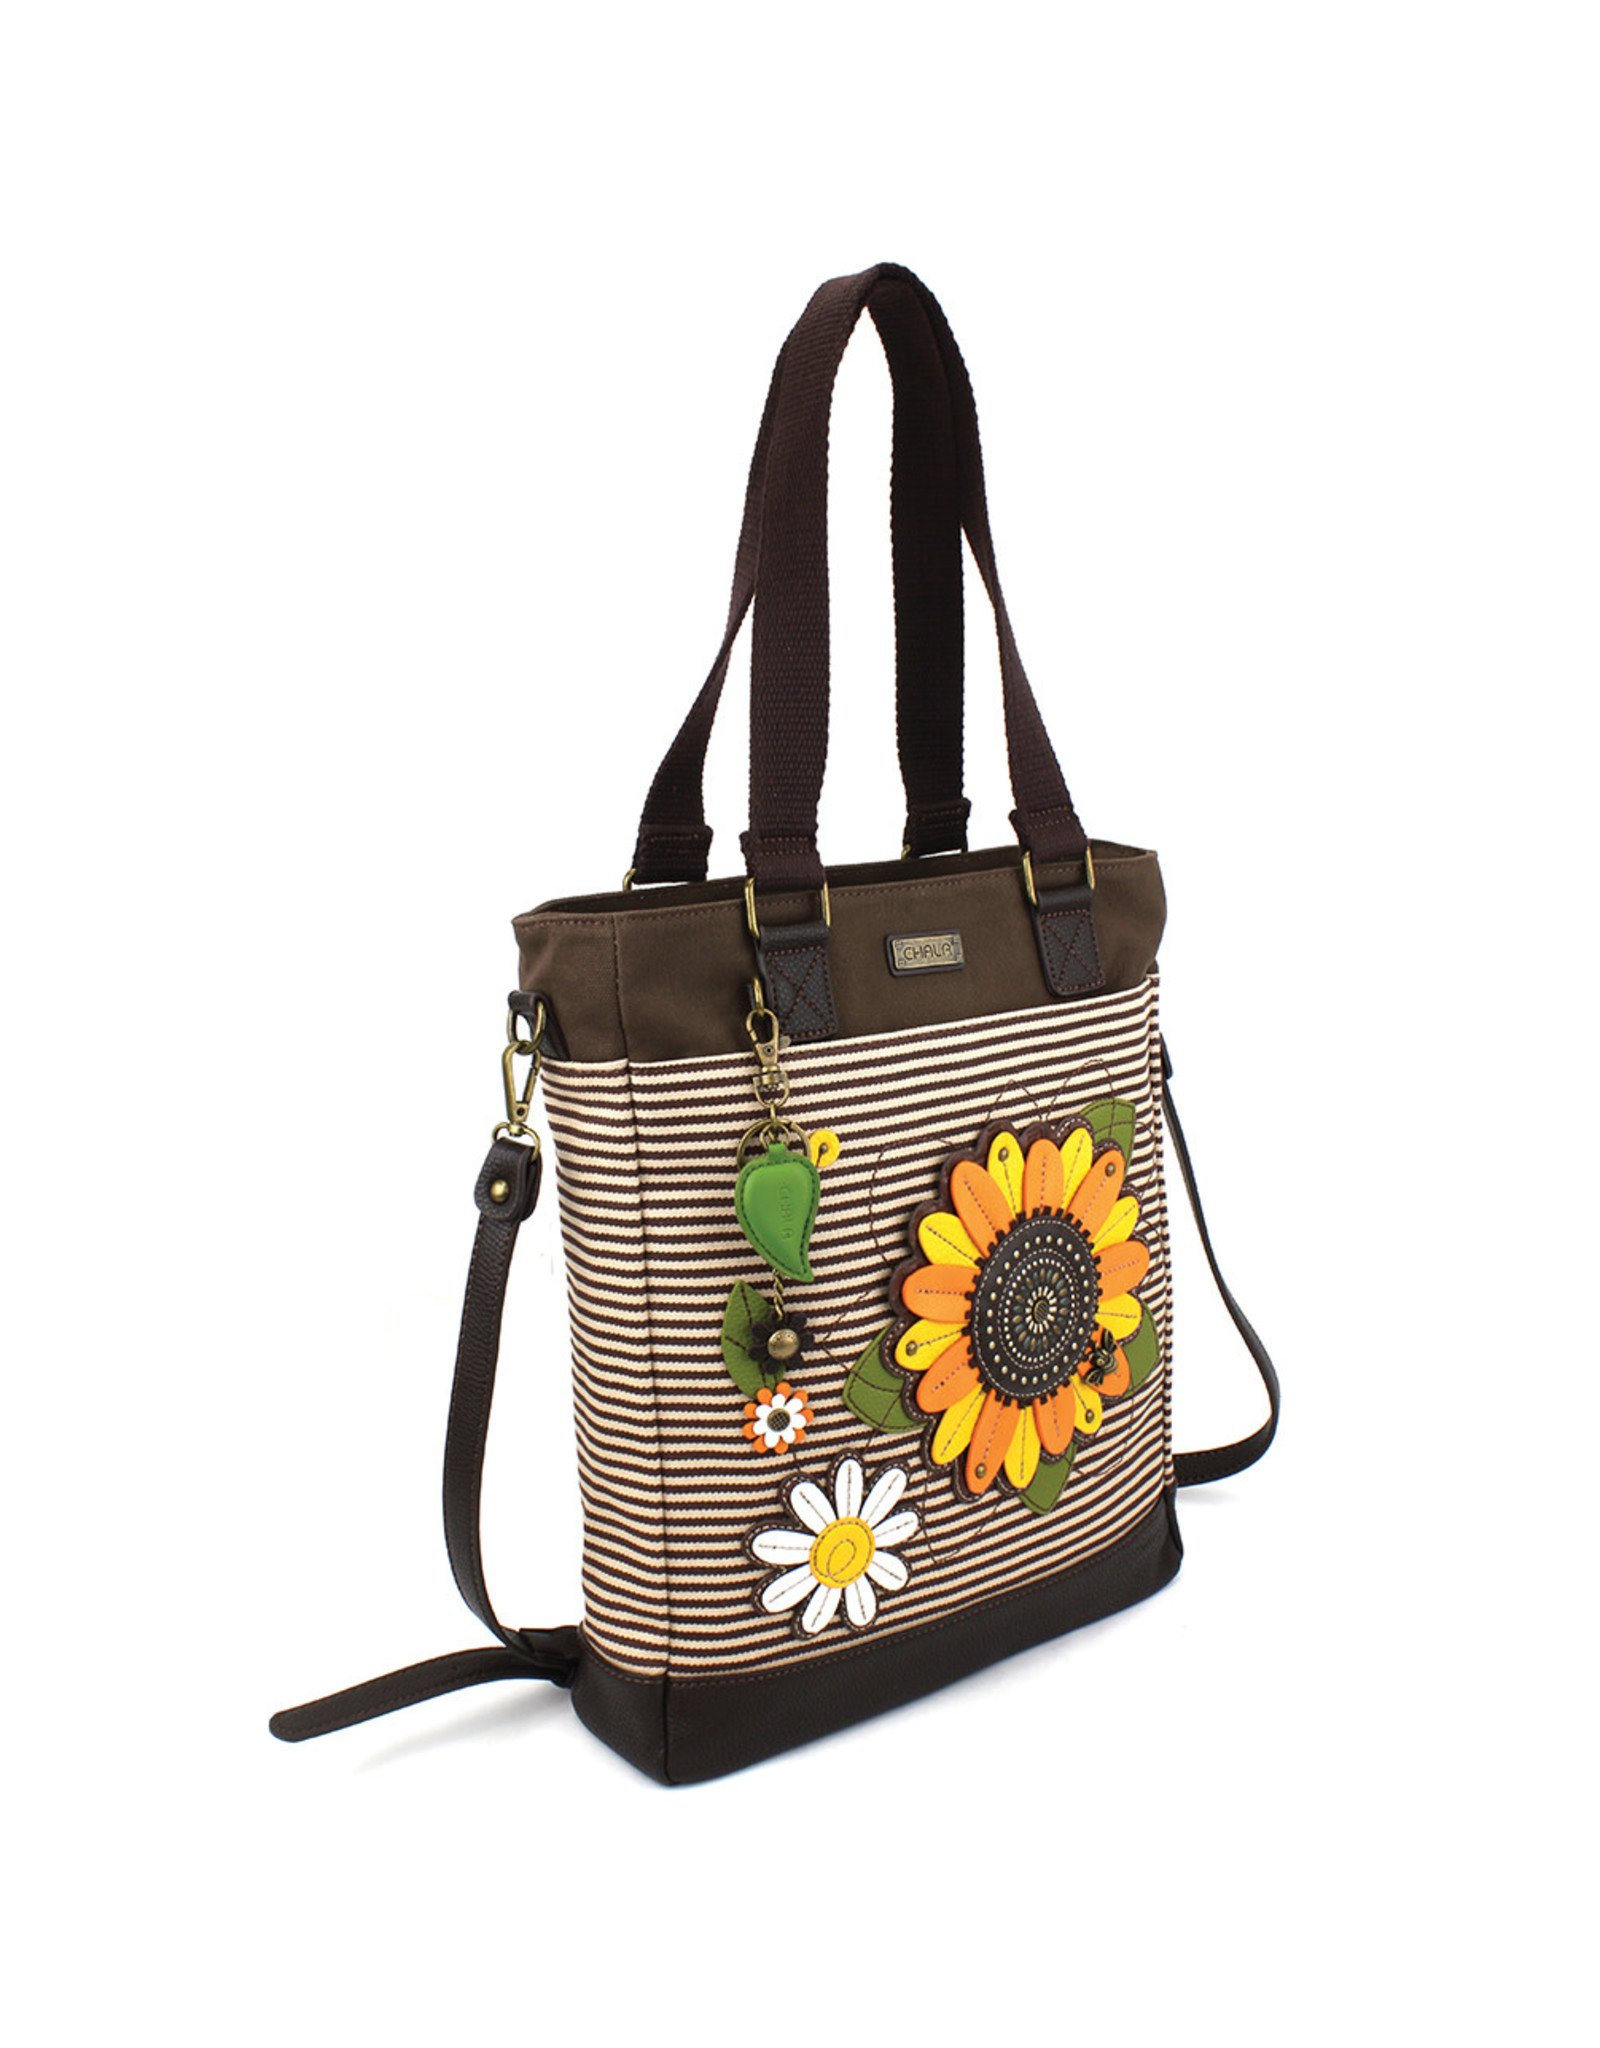 Chala Work Tote - Sunflower